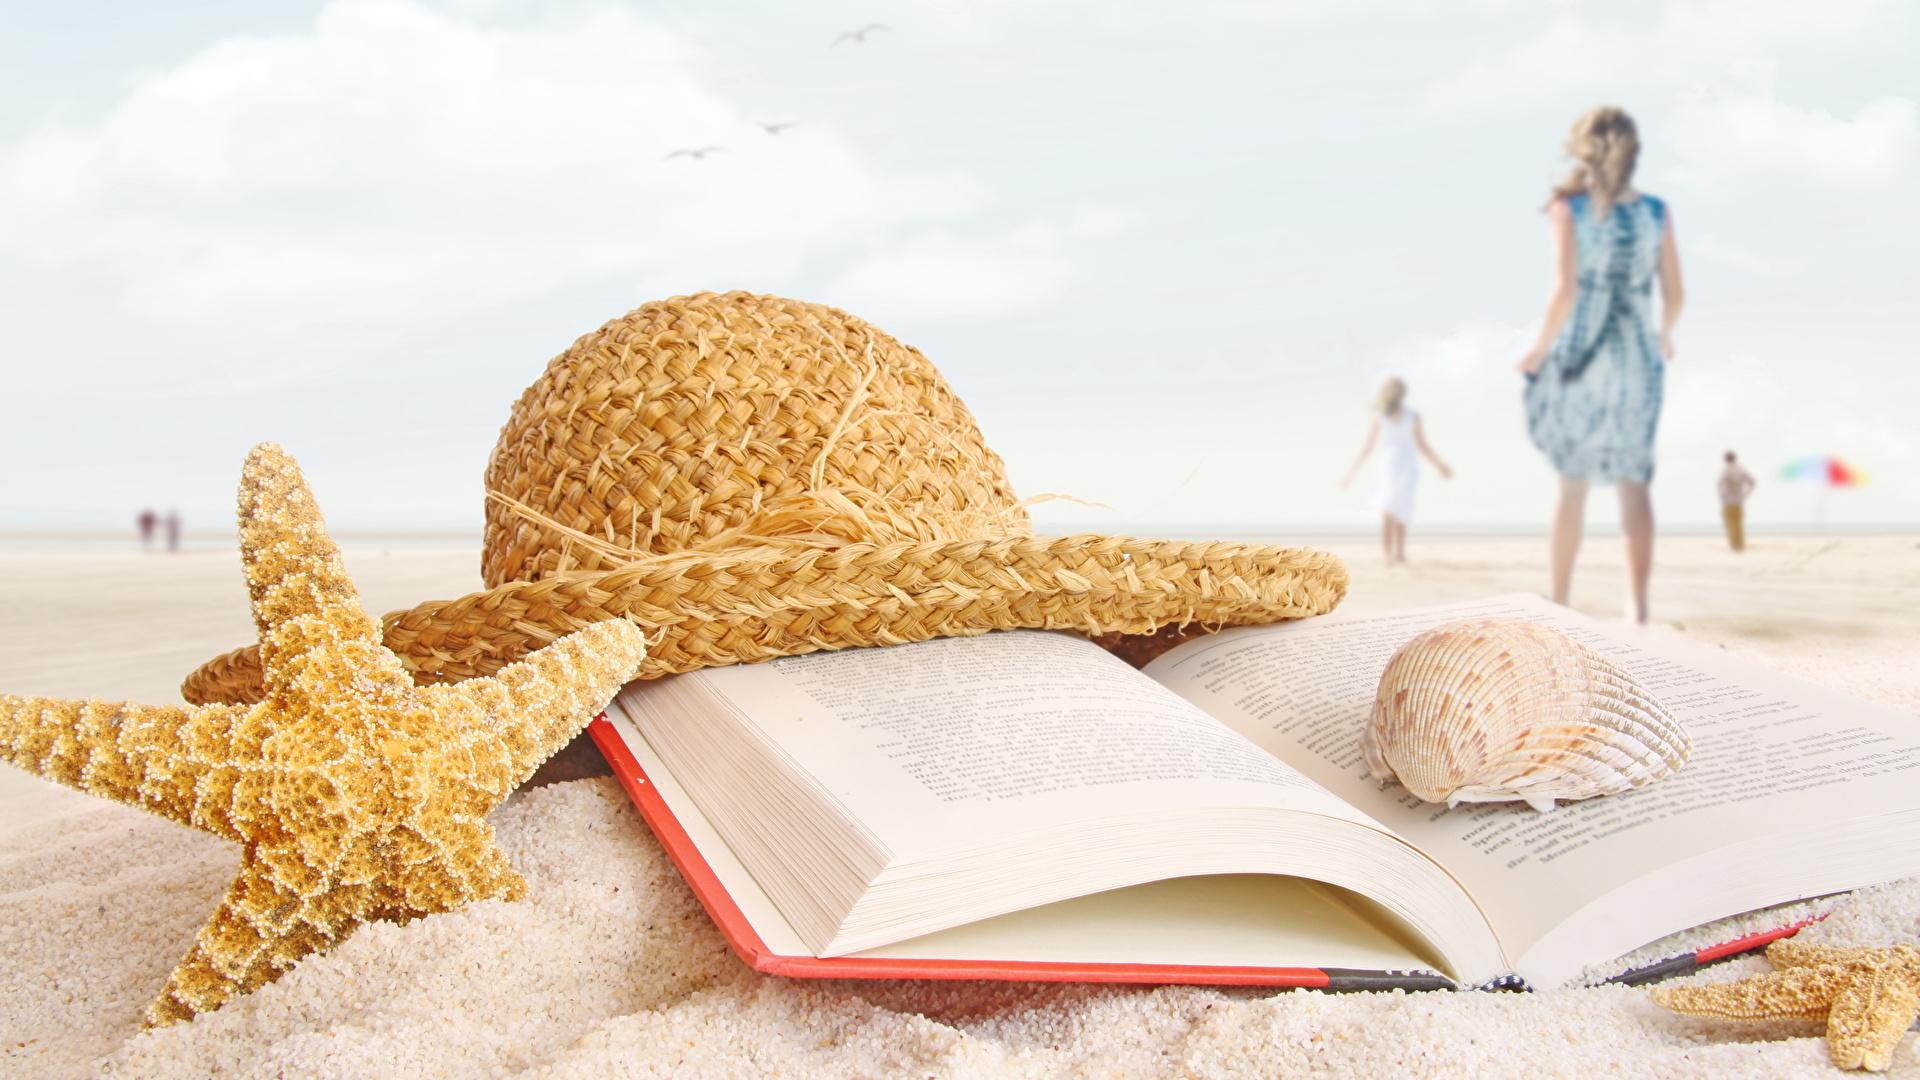 Desktop Wallpapers Starfish beaches Hat Sand Shells Book 1920x1080 sea stars Beach books